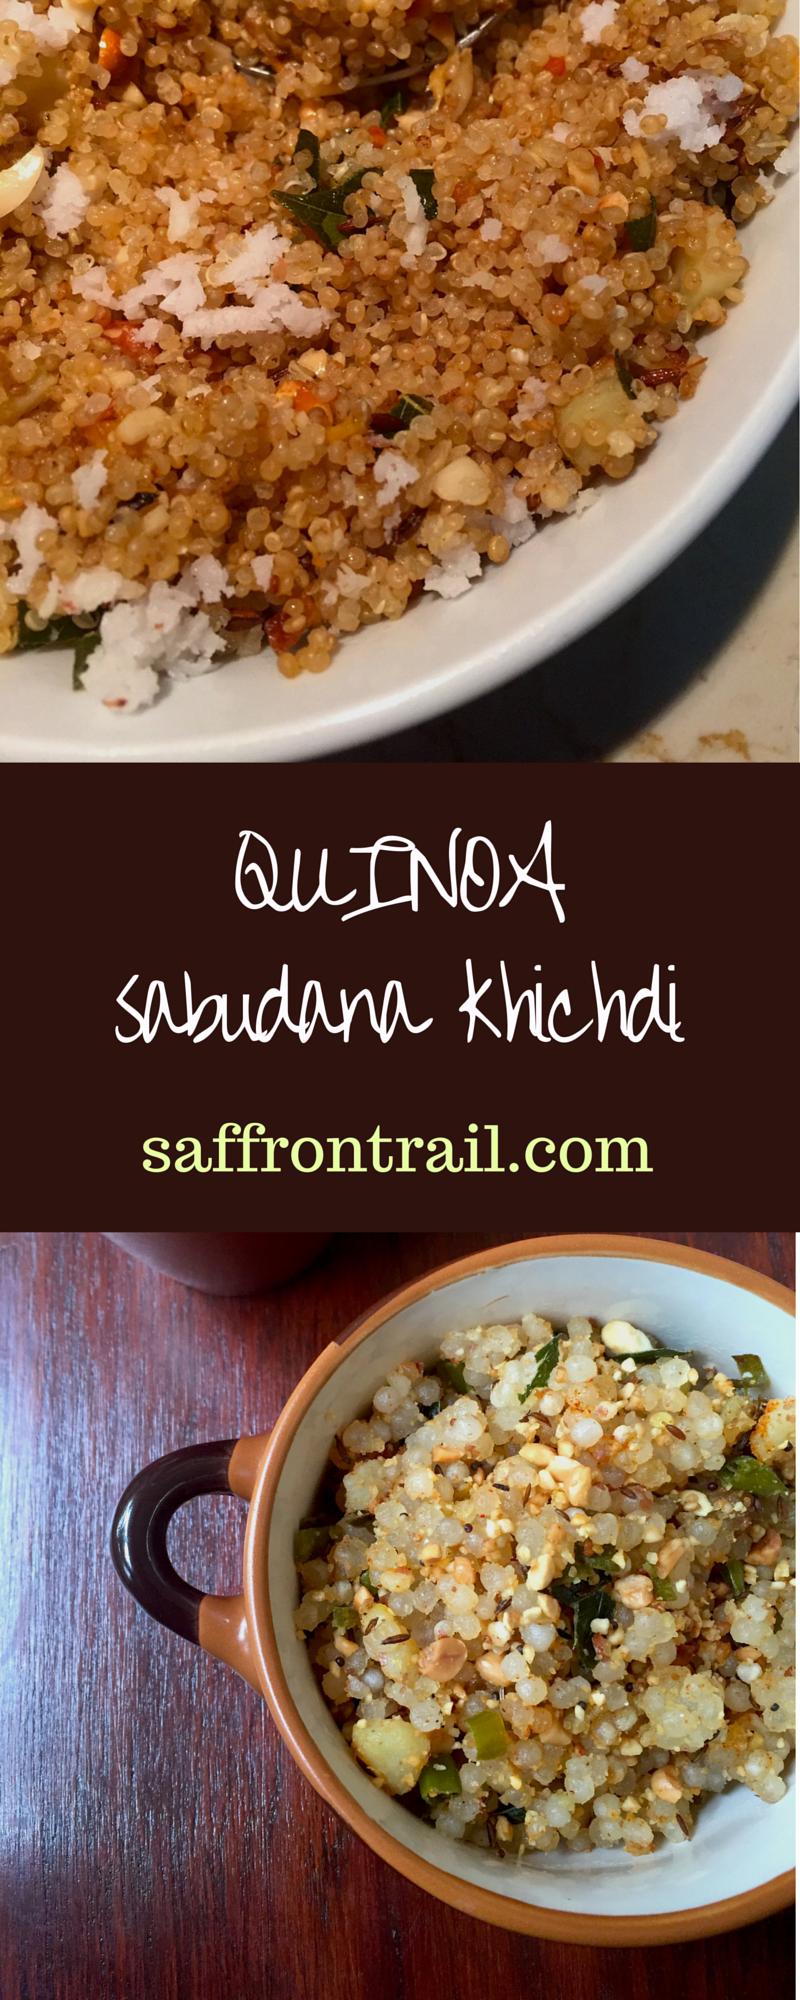 Healthy Sabudana Khichdi With Quinoa Recipe Vegetarian Recipes Healthy Easy Sabudana Khichdi Farali Recipes